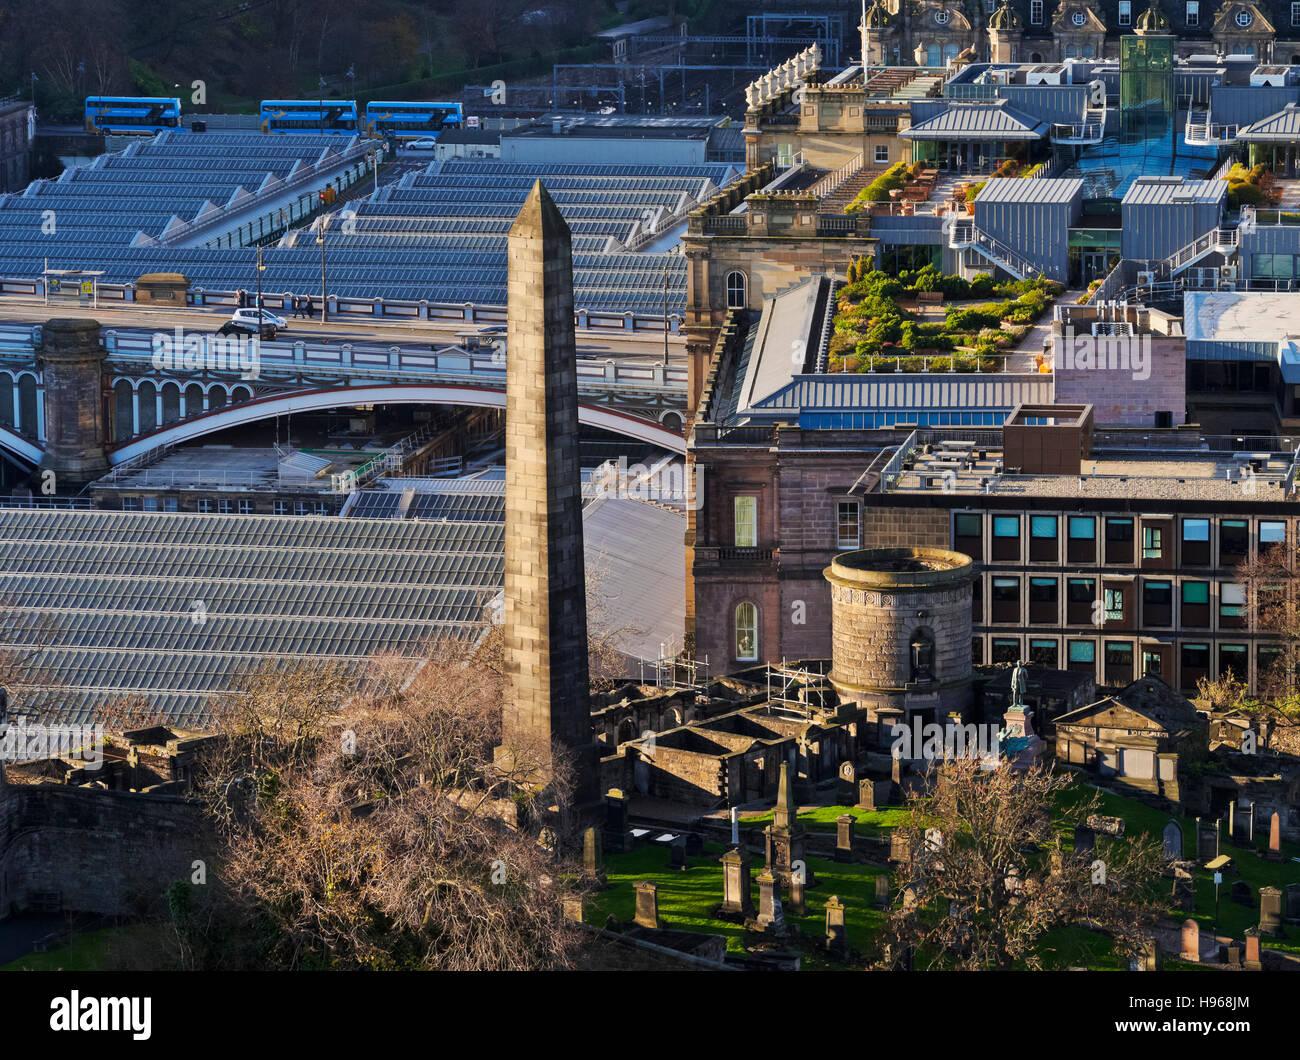 UK, Scotland, Lothian, Edinburgh, Calton Hill, View from the Nelson Monument towards the Old Calton Burial Ground. Stock Photo